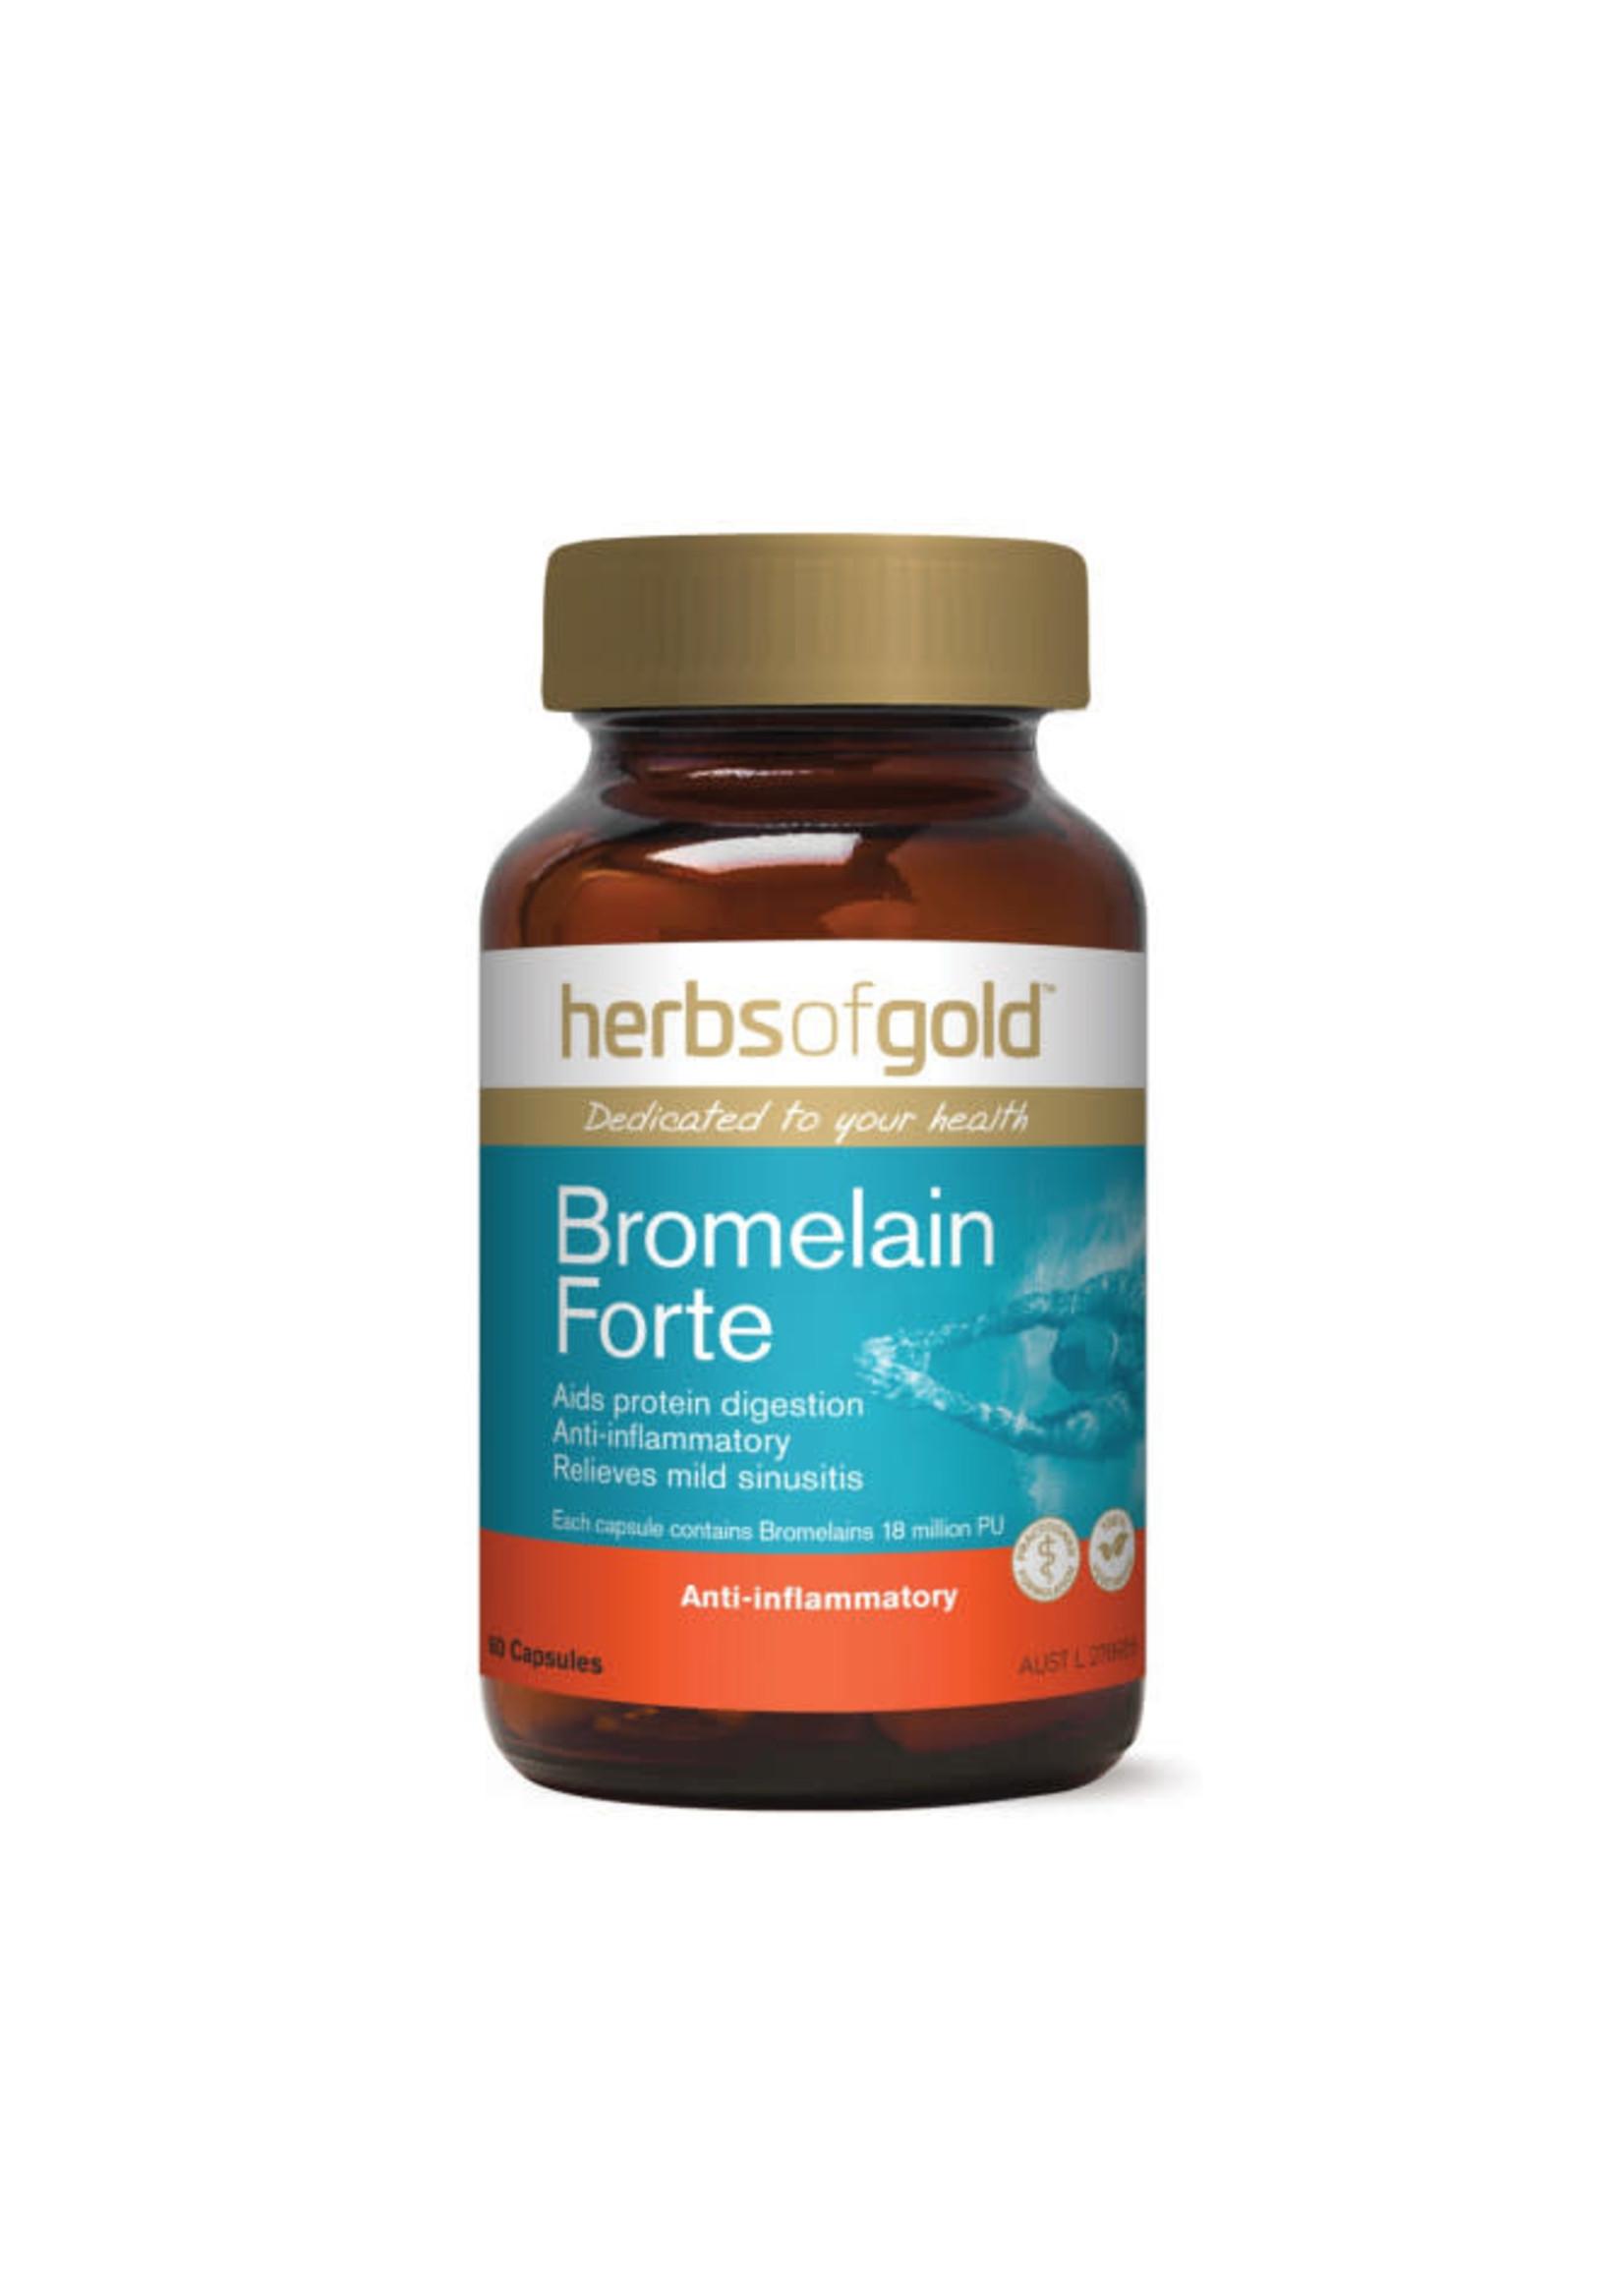 Herbs of Gold Herbs of Gold Bromelain Forte 60 Capsules